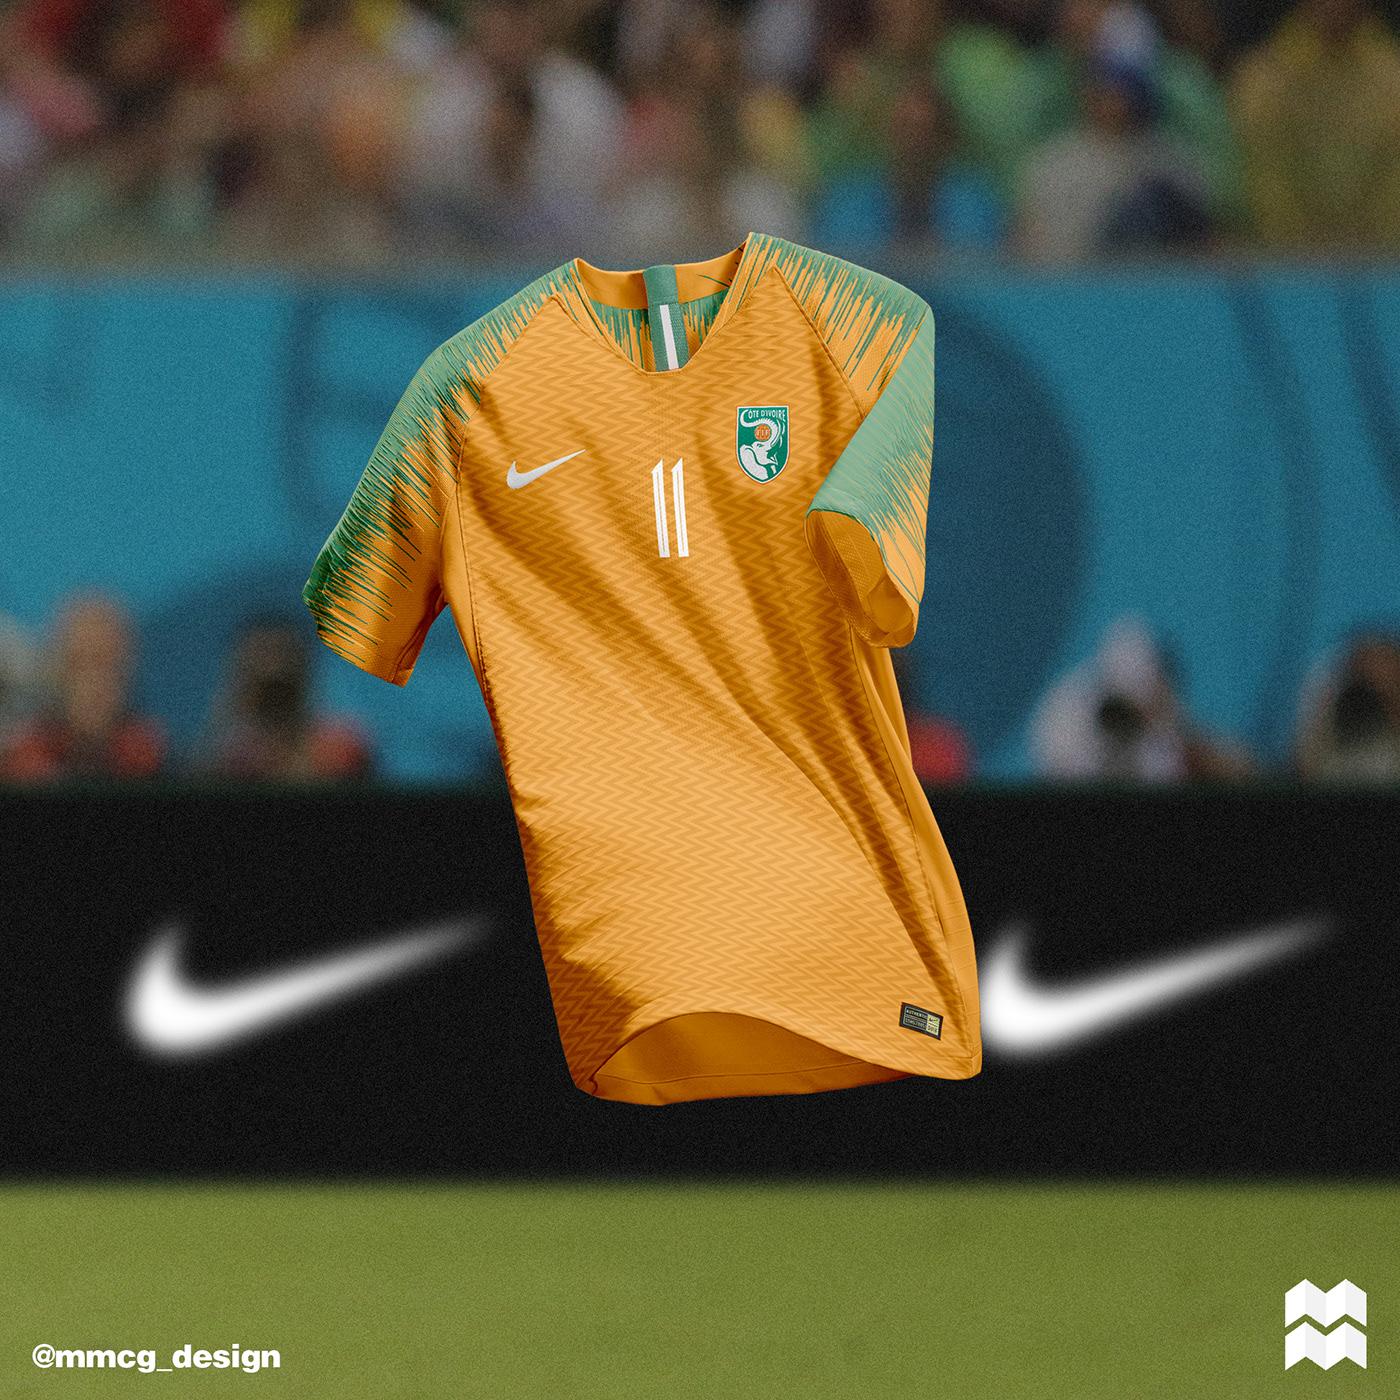 3f93a74d2ea7a Nike International Jerseys 2018 19 on Behance